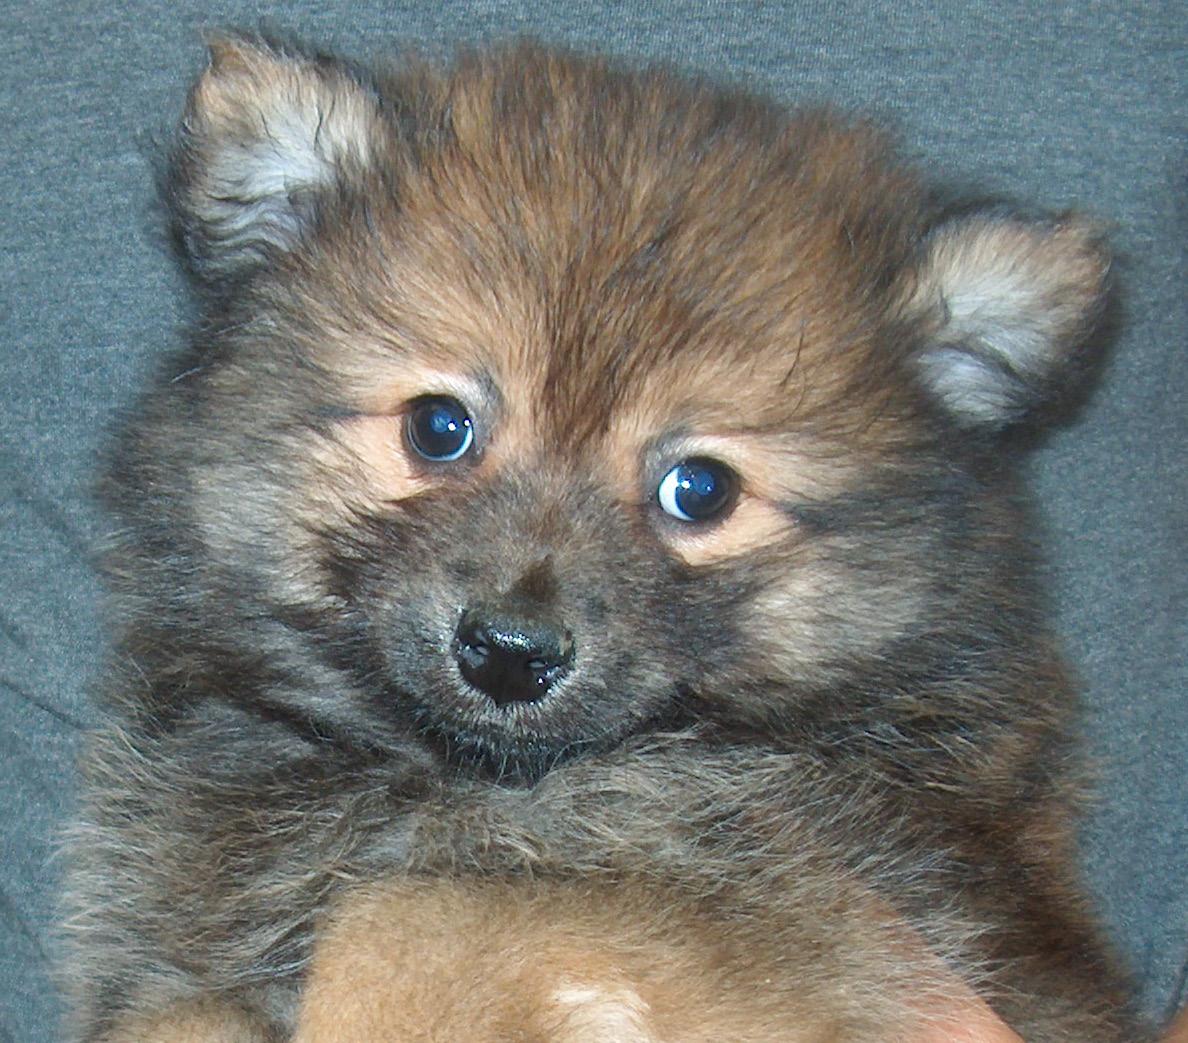 Husky Border Collie Mix Puppies Cute Dogs: Pomeranian ...